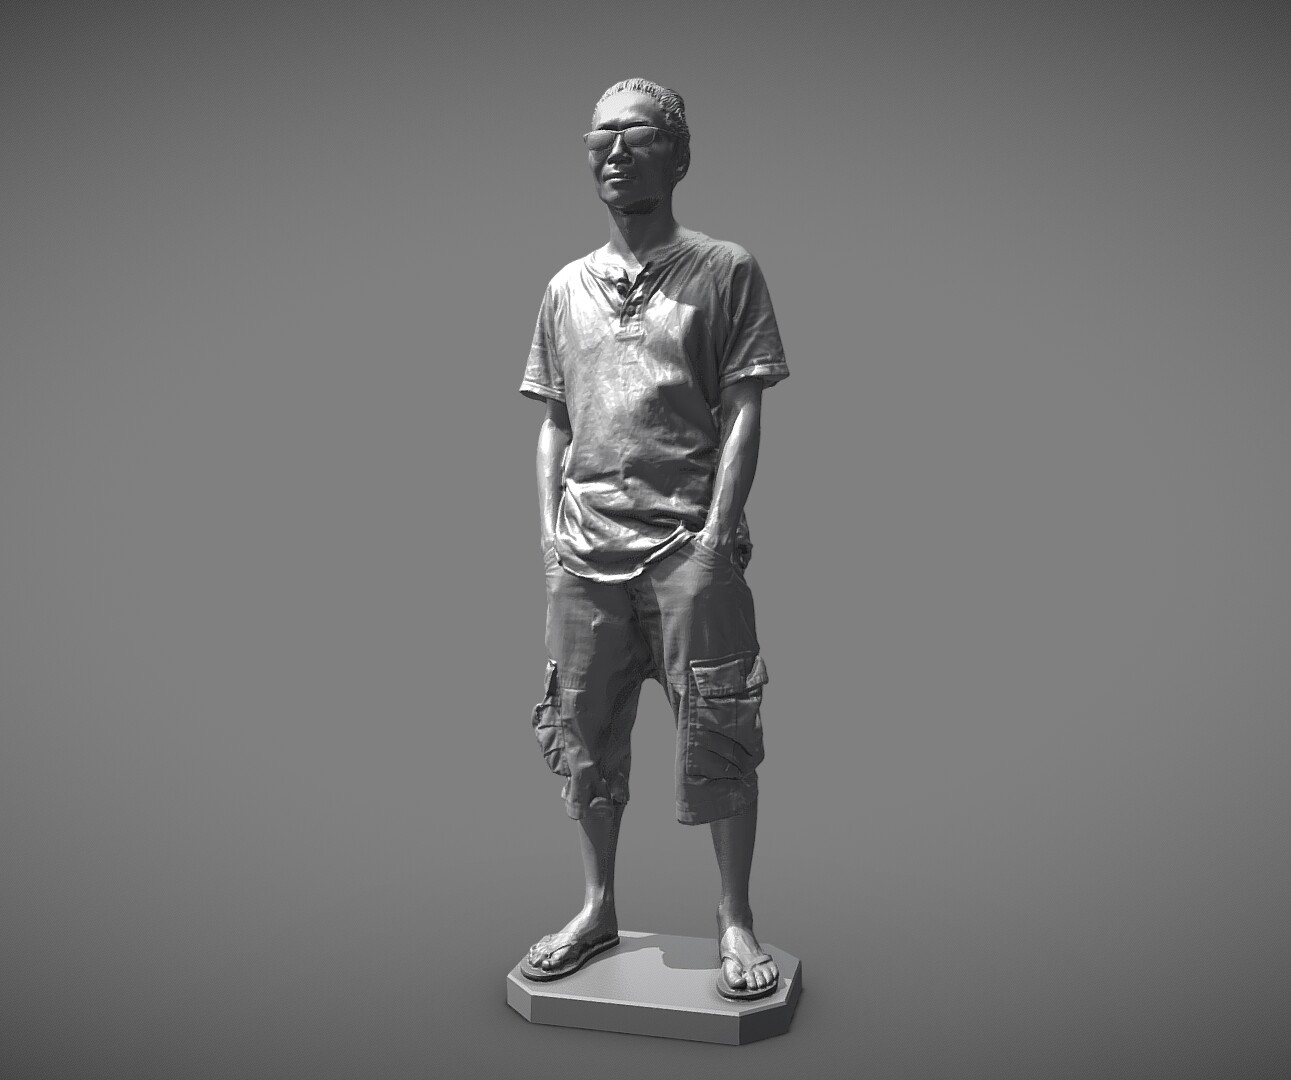 Michael wu 3d models by mwopus mwopus sketchfab20190320 007961